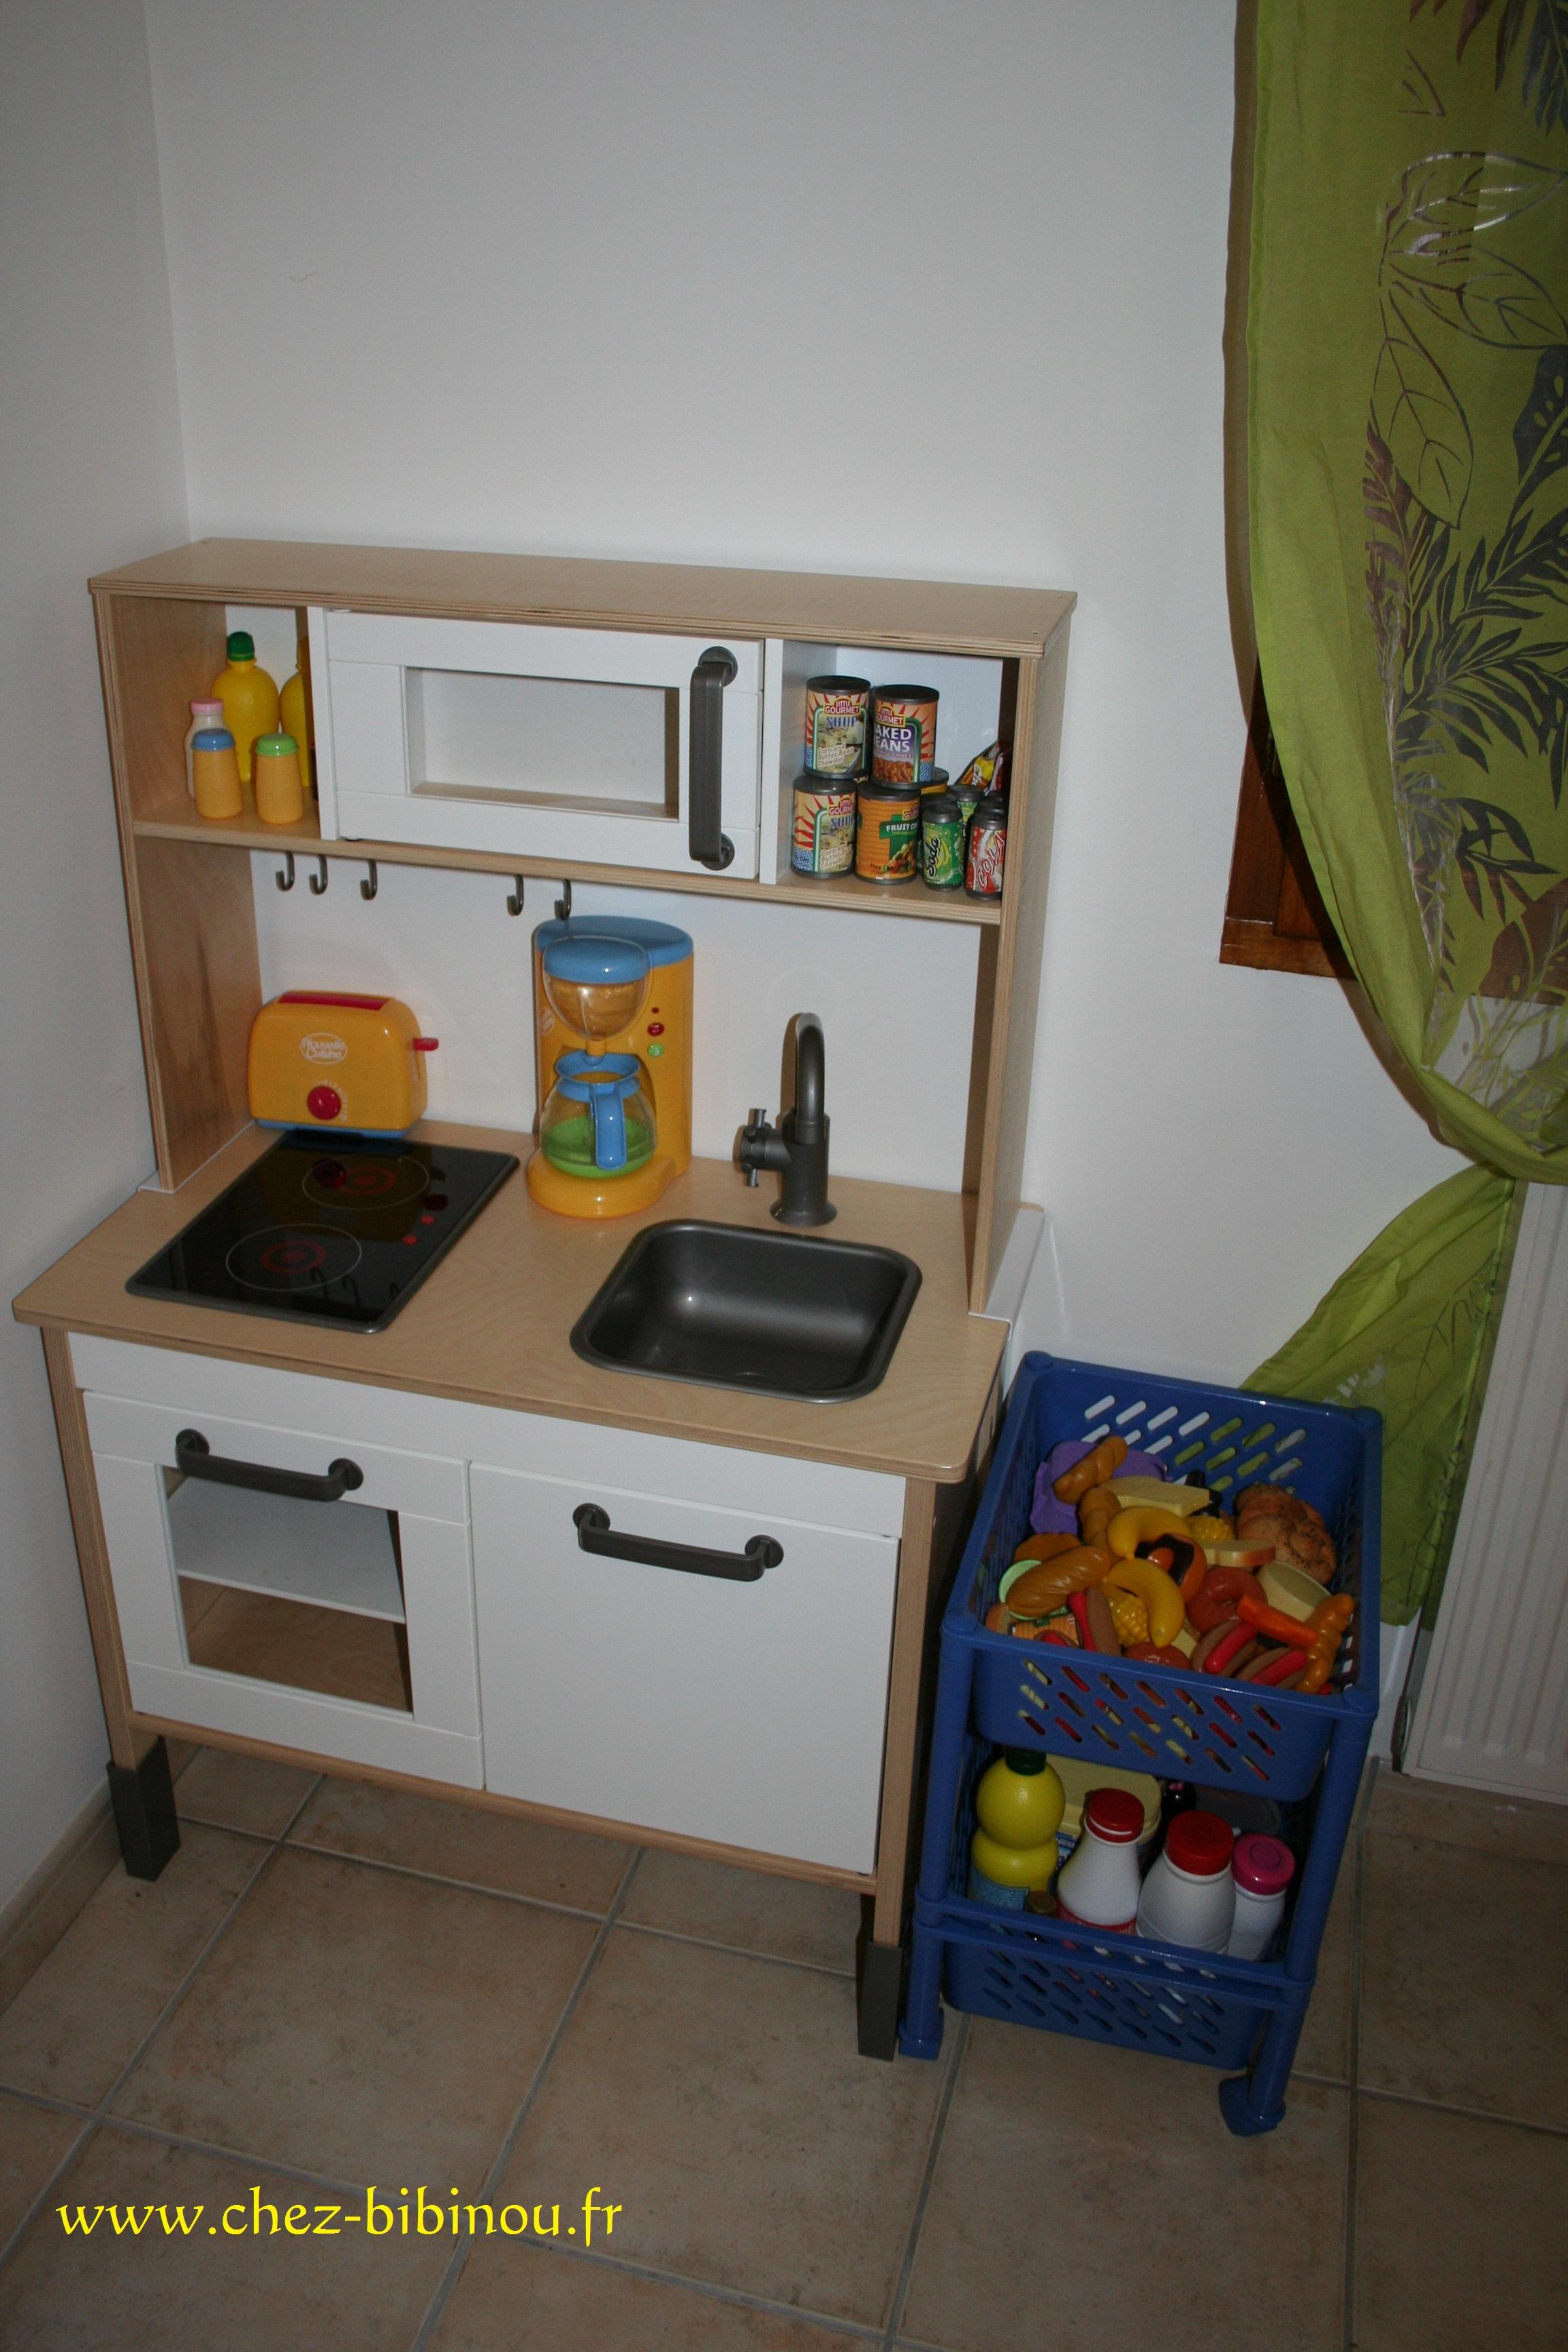 Petite visite chez bibinou for Petite cuisine ikea